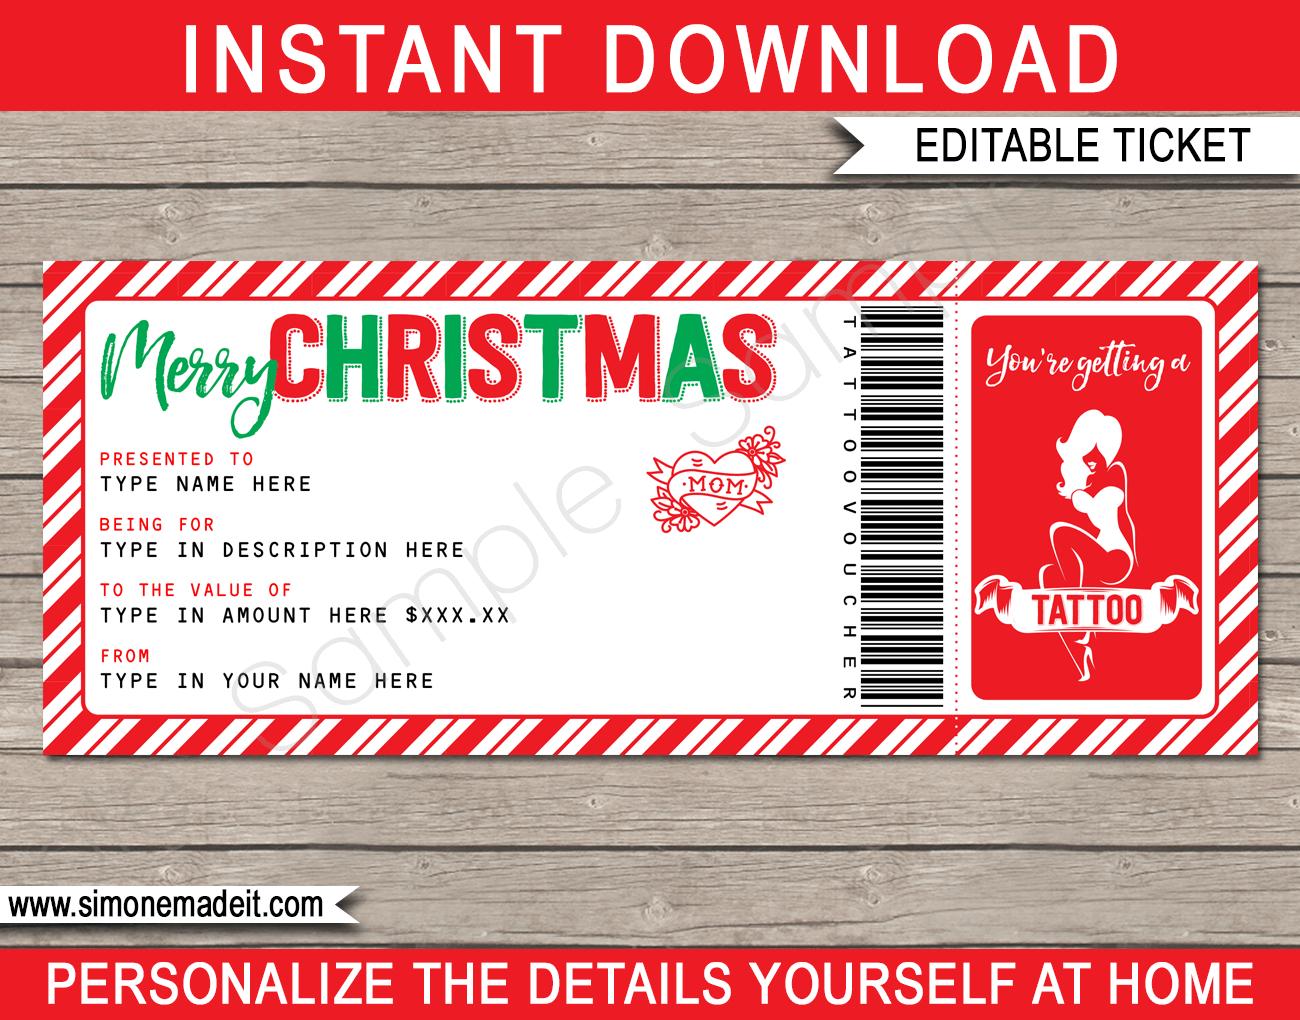 Christmas Tattoo Gift Vouchers Inside Tattoo Gift Certificate Template